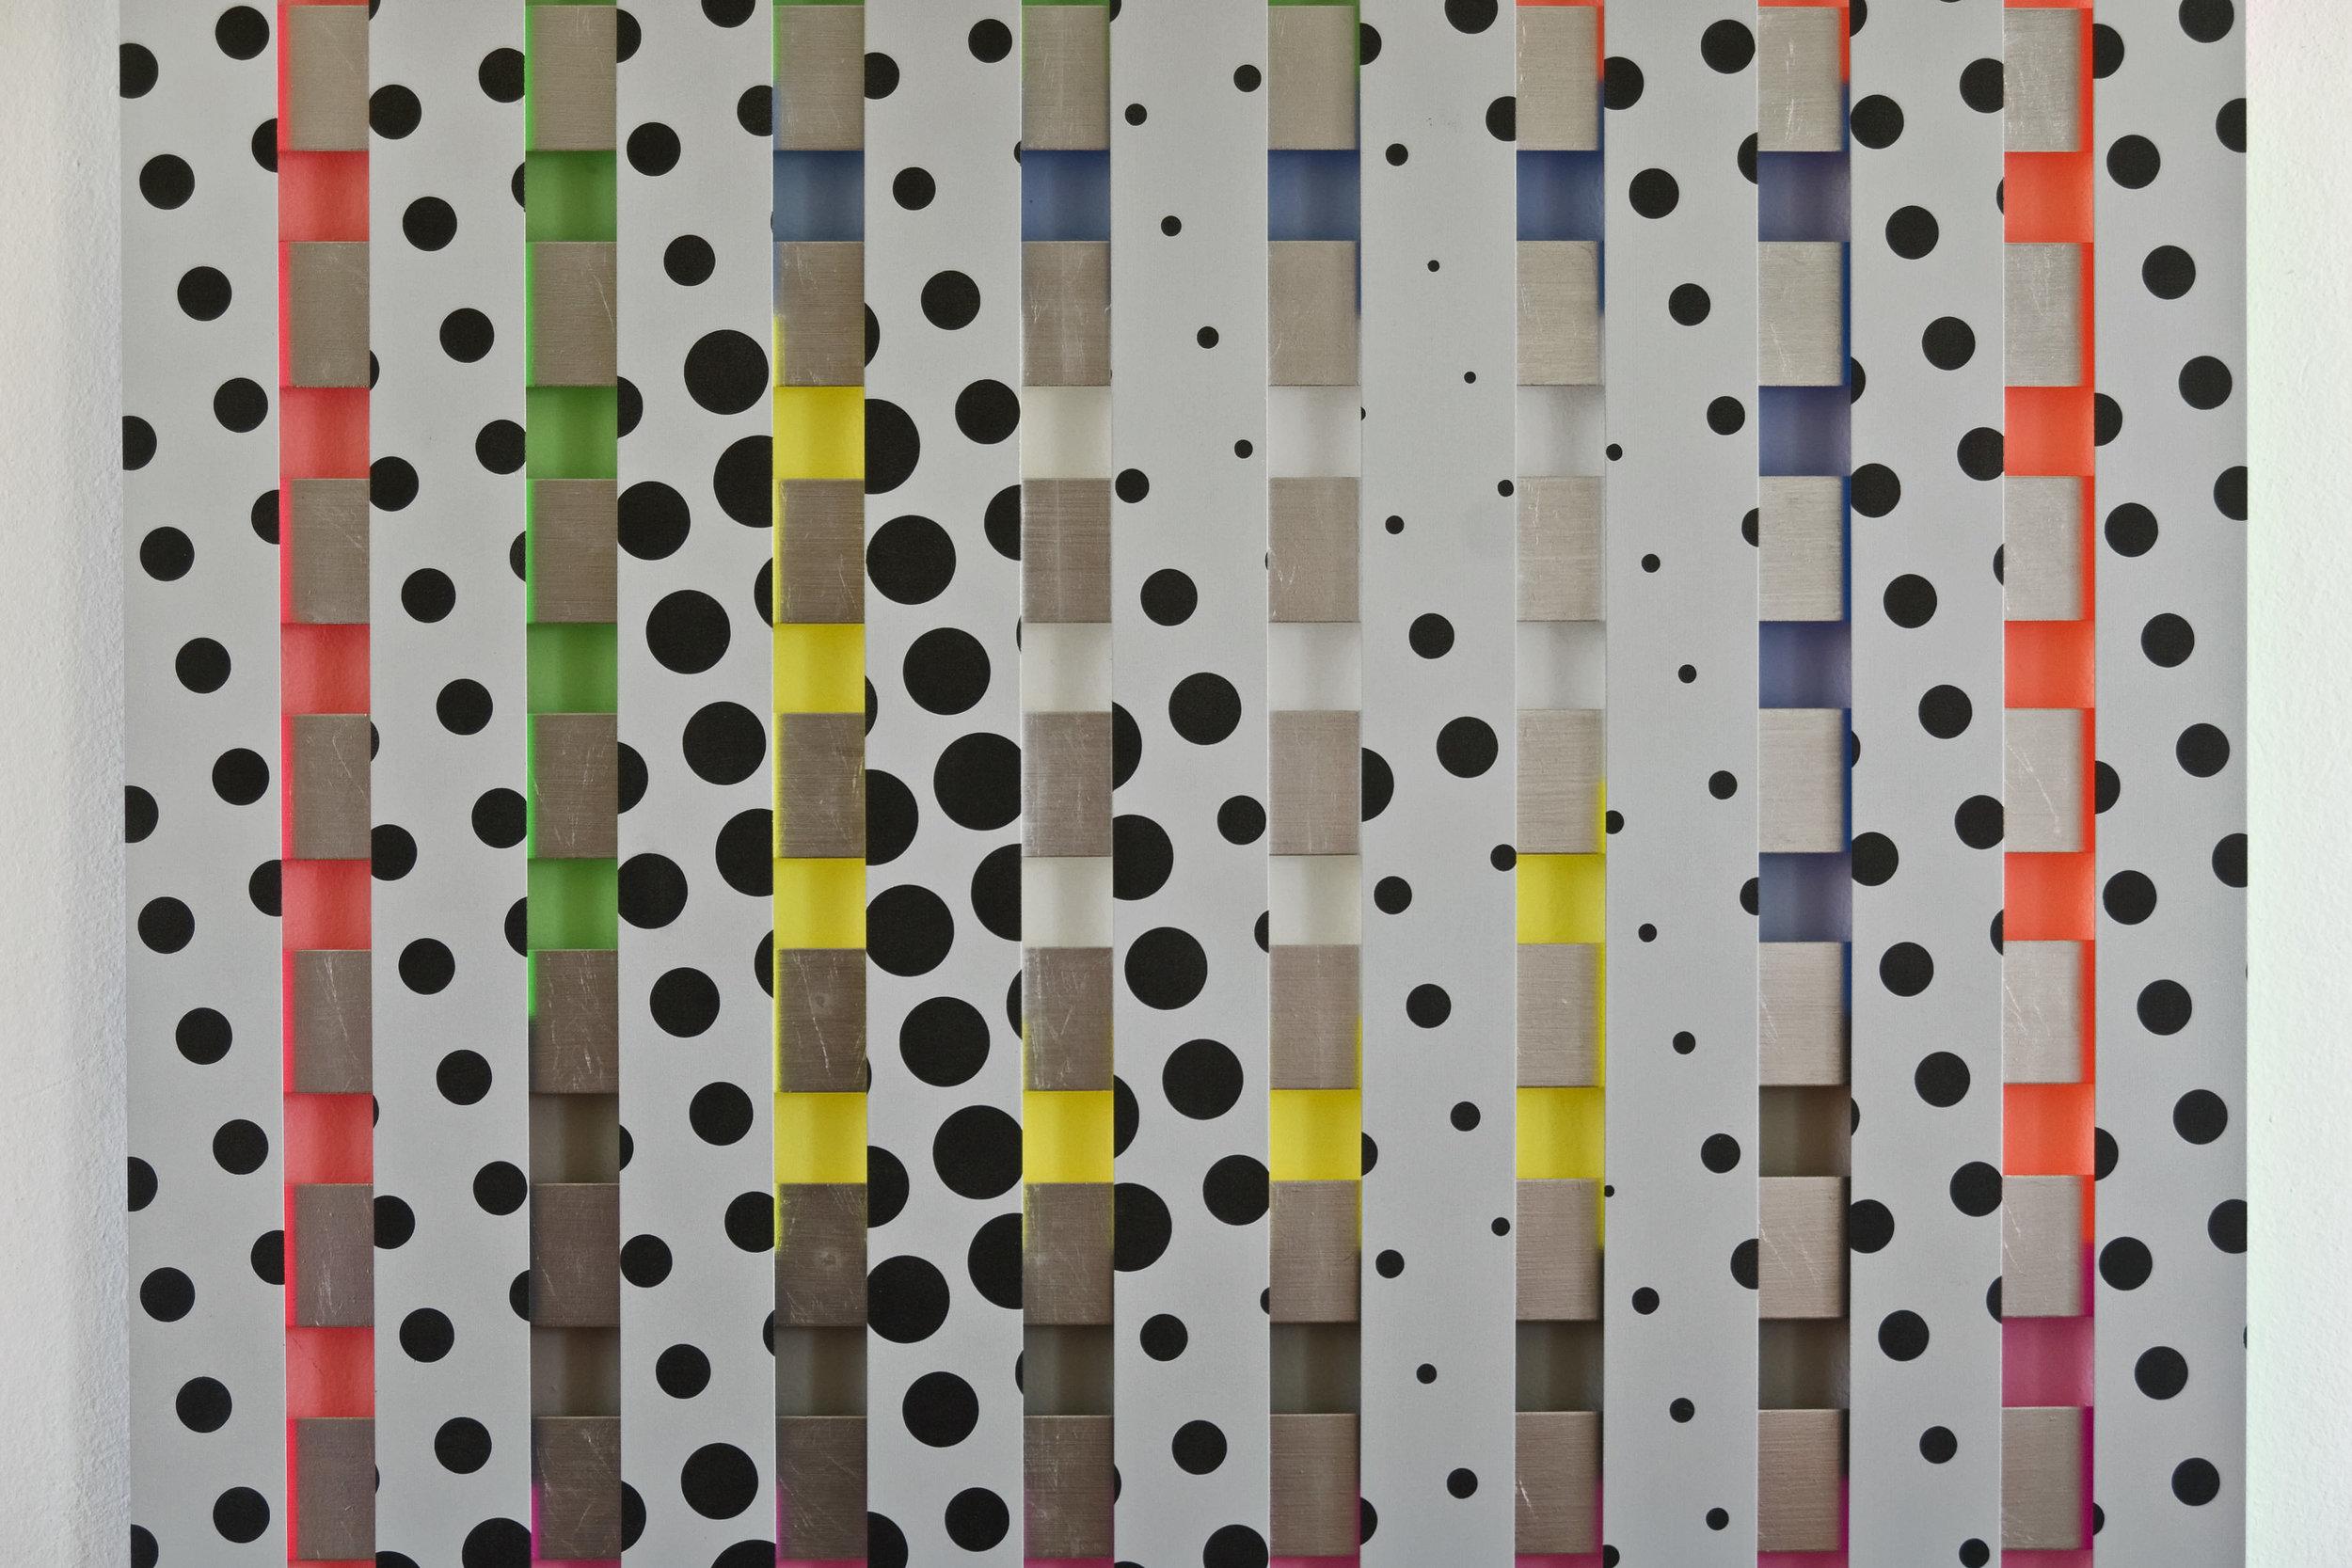 3f akril, les, 121 x 121 cm, 2010, detajl.jpg